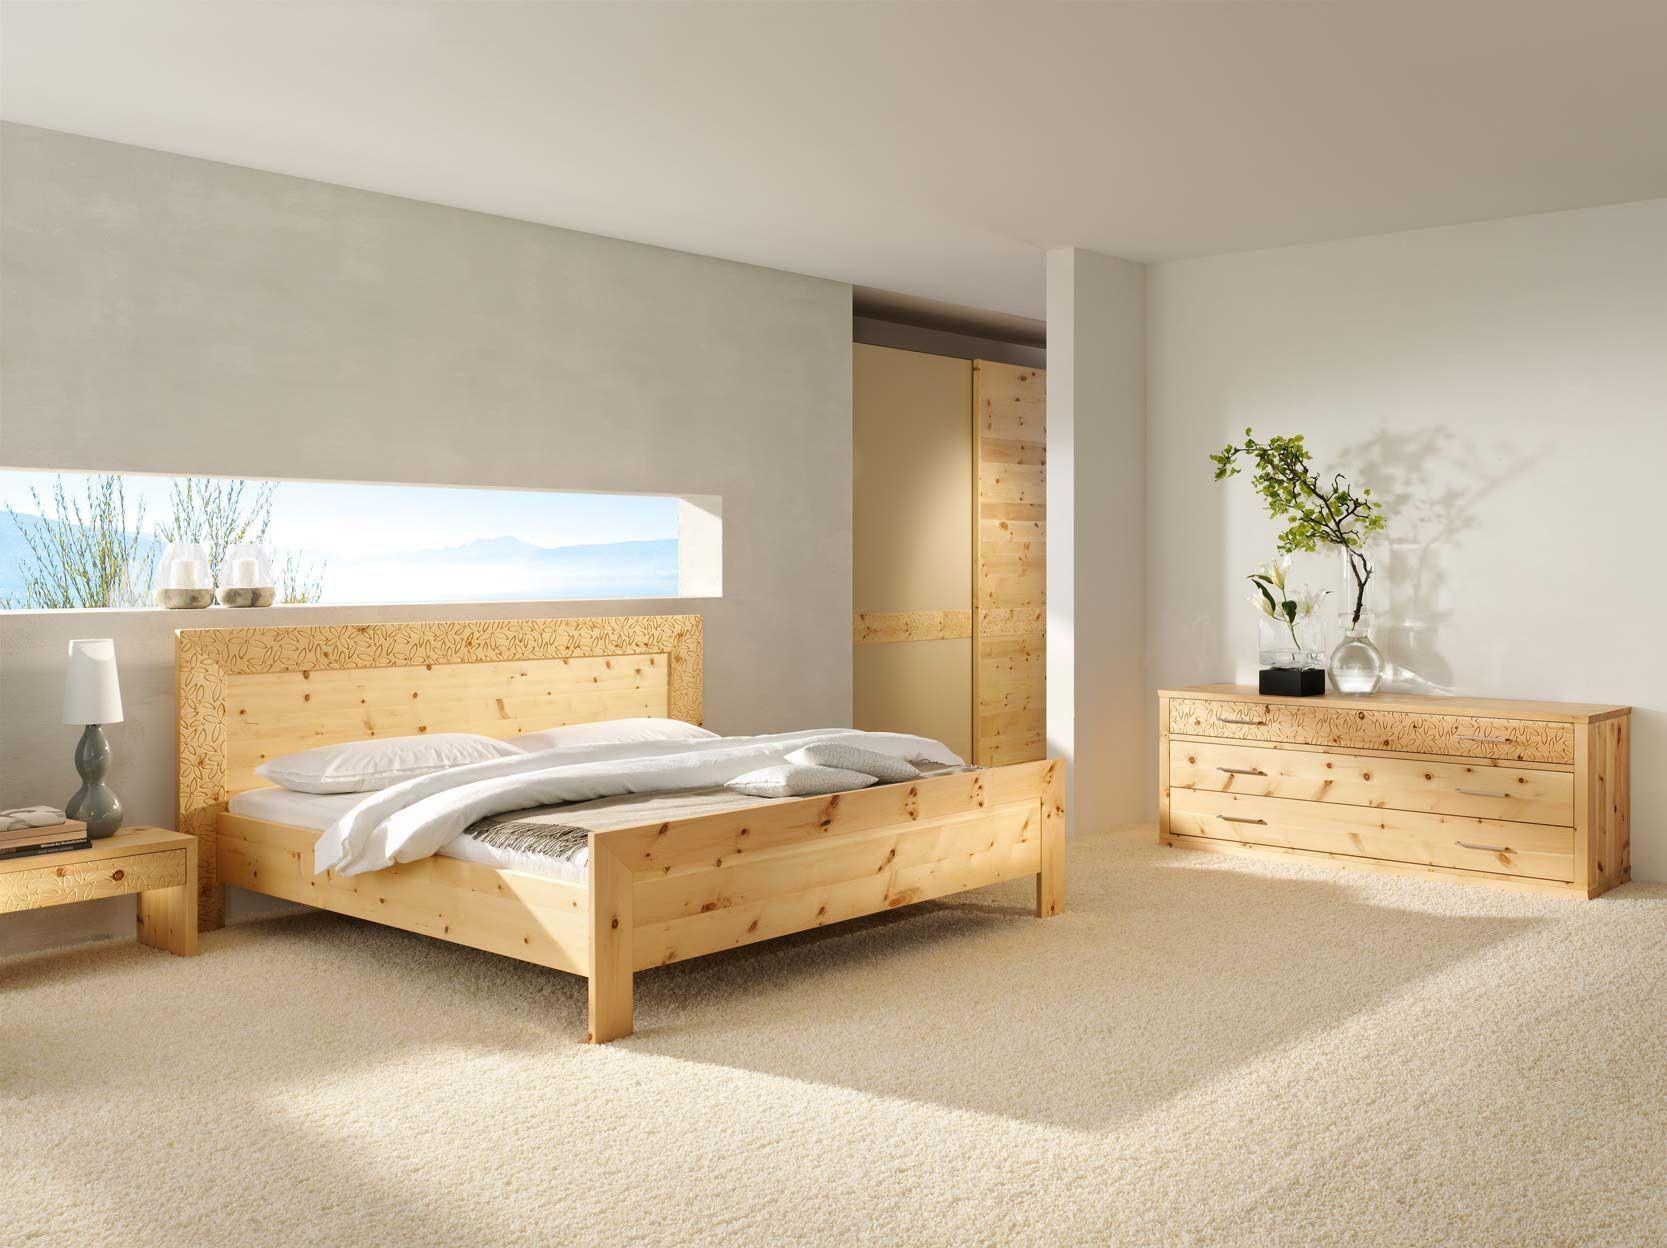 handgefertigte Massivholz Möbel, Zirbenholz, Bett ...